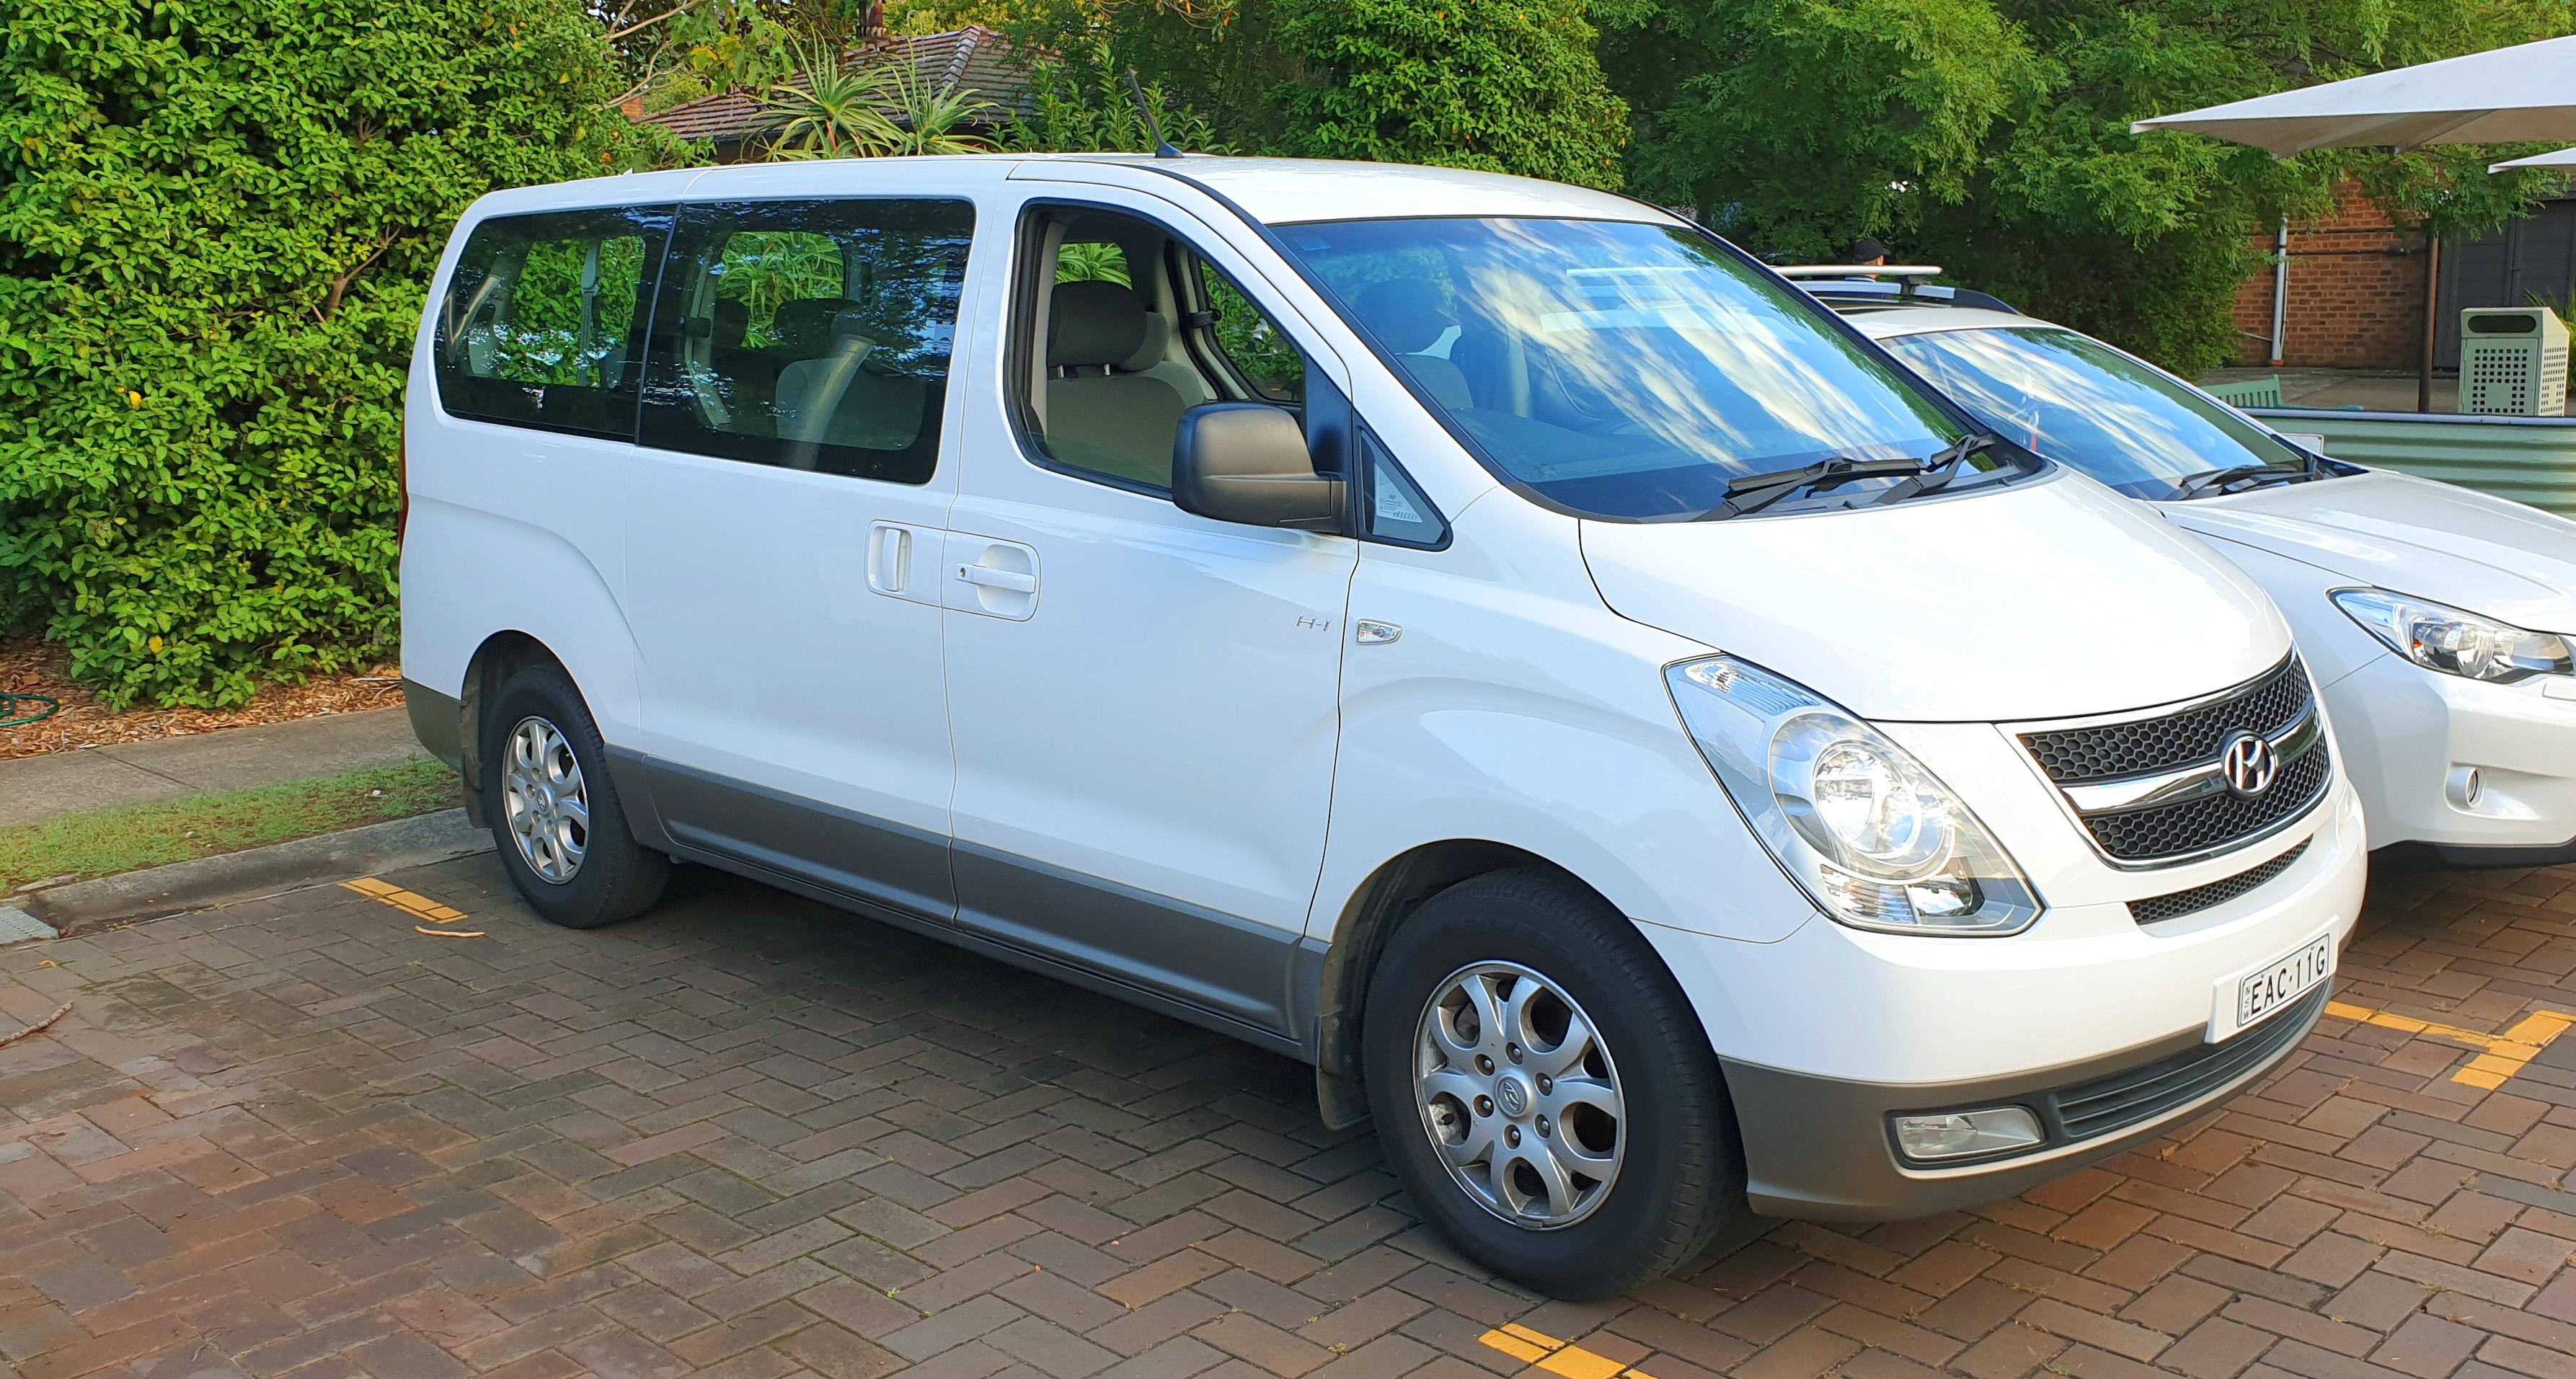 Picture of Bijendra's 2012 Hyundai Imax